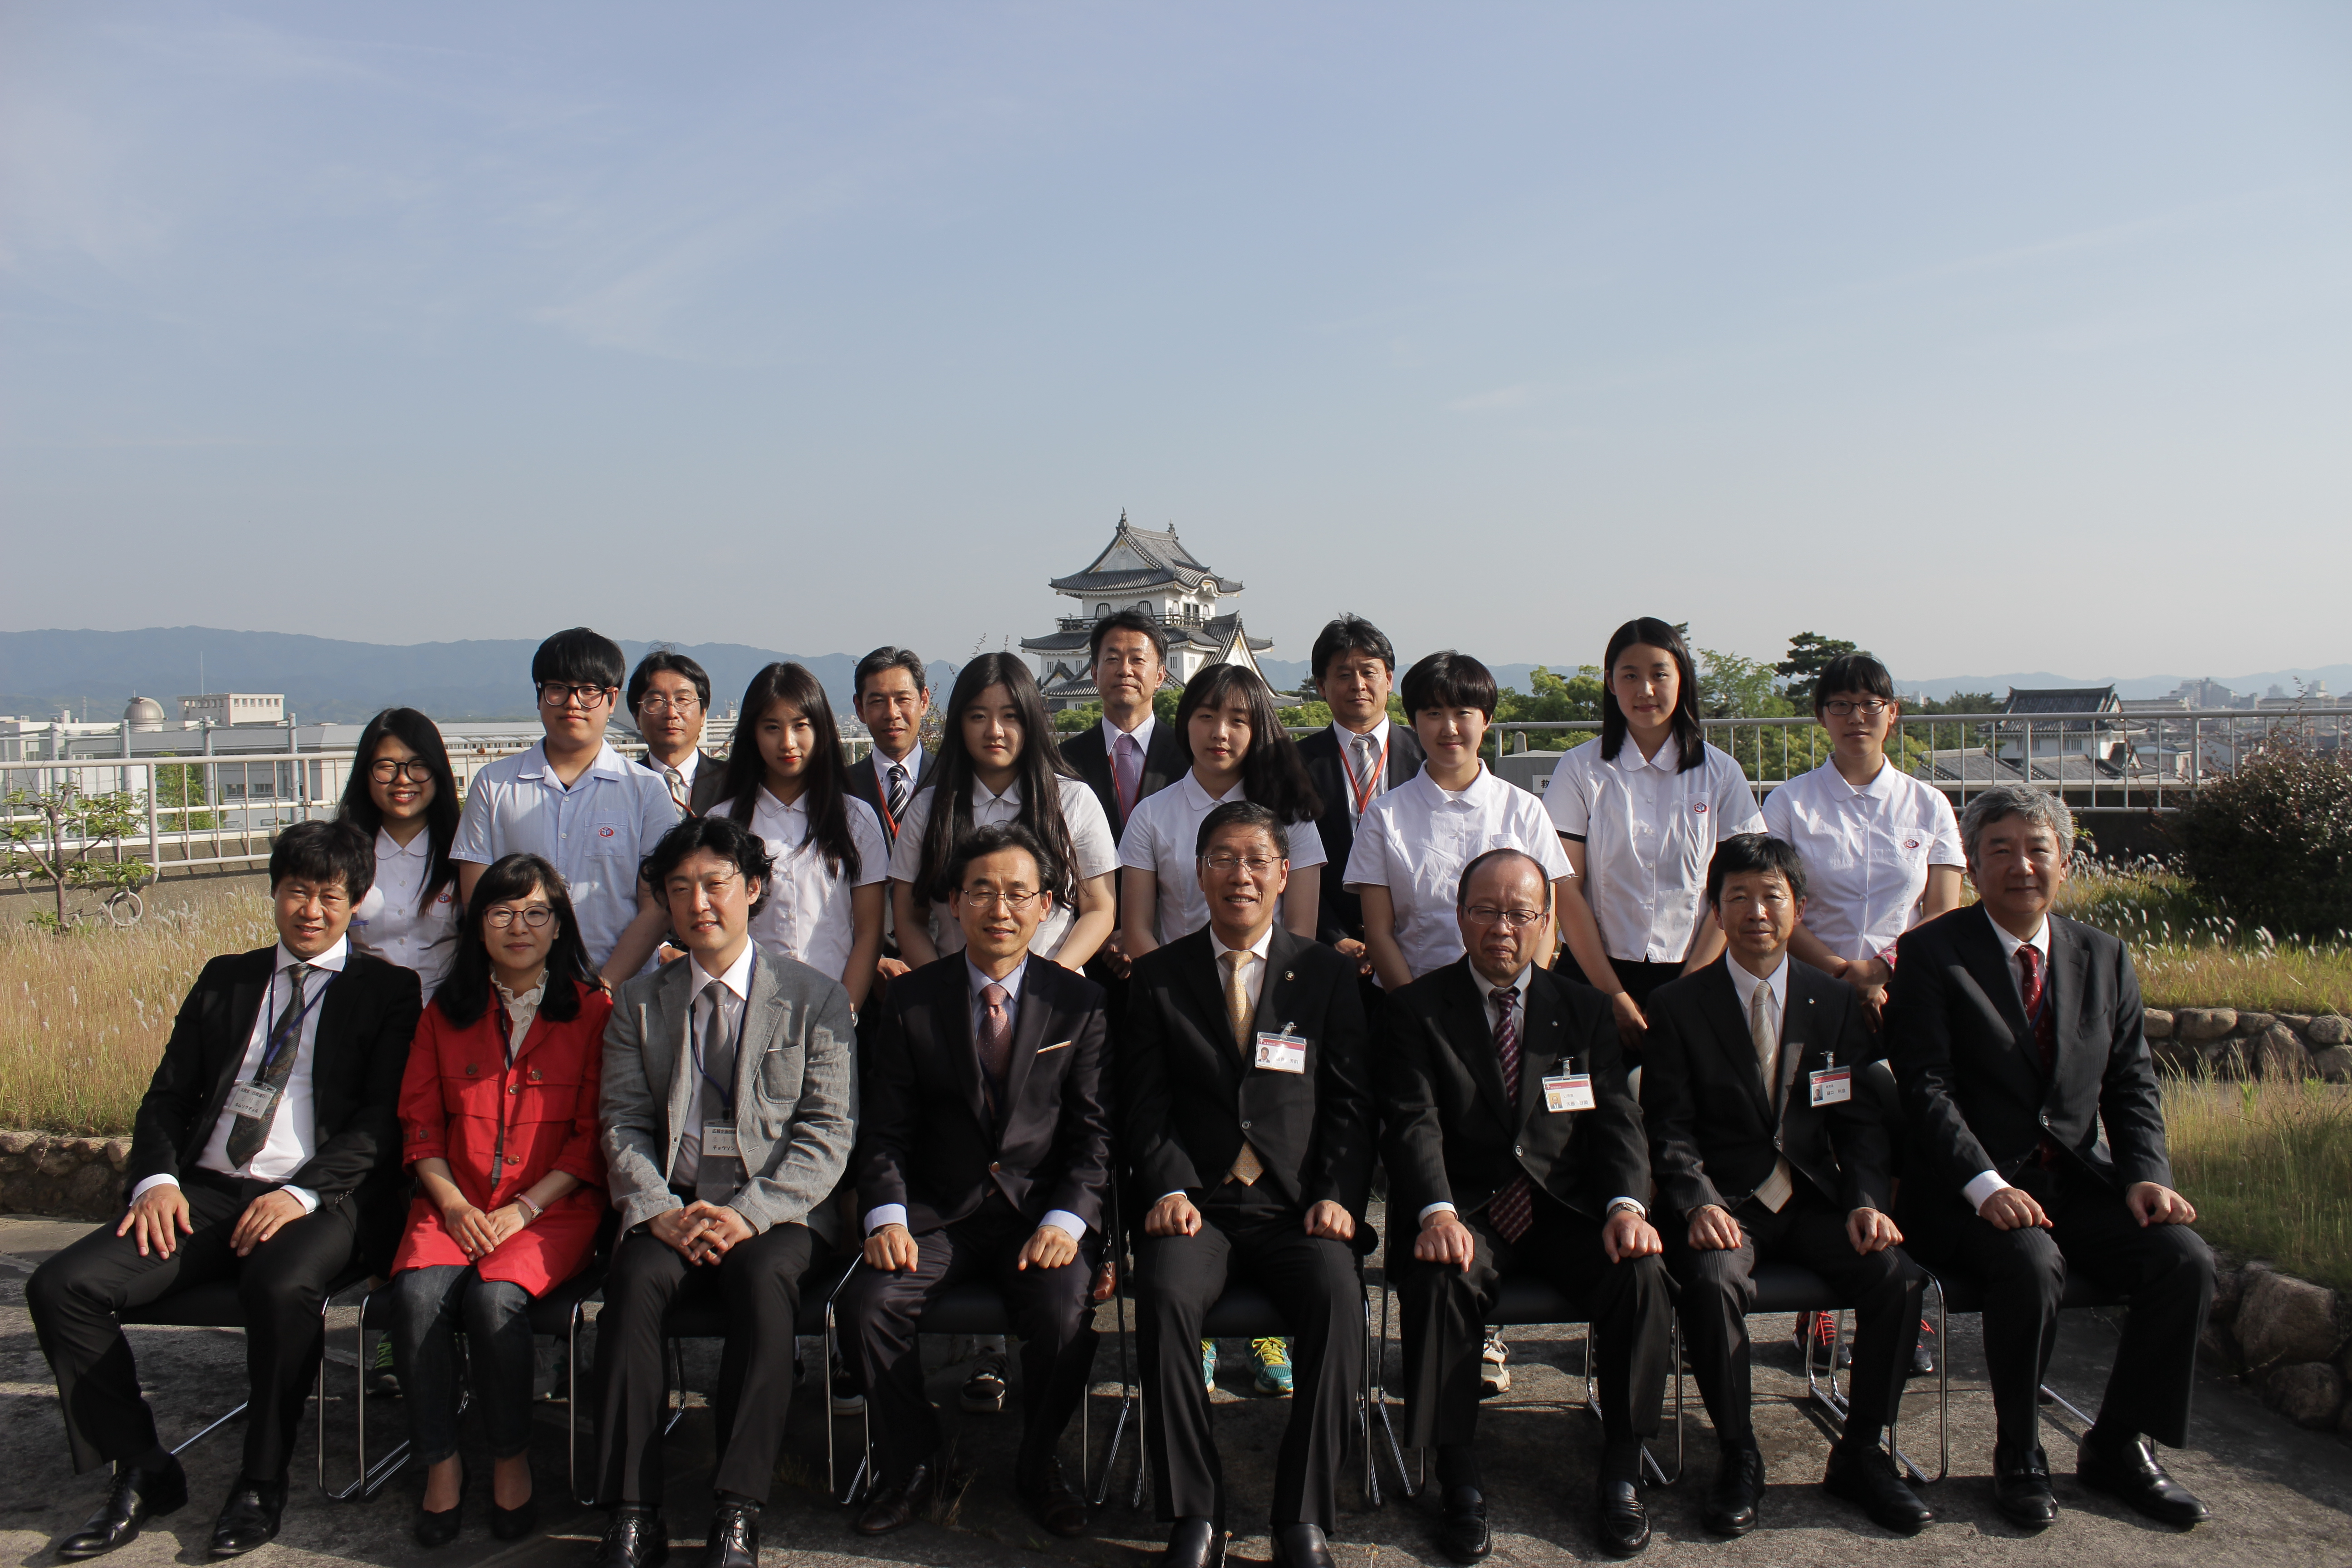 現代高等学校 (ソウル特別市)